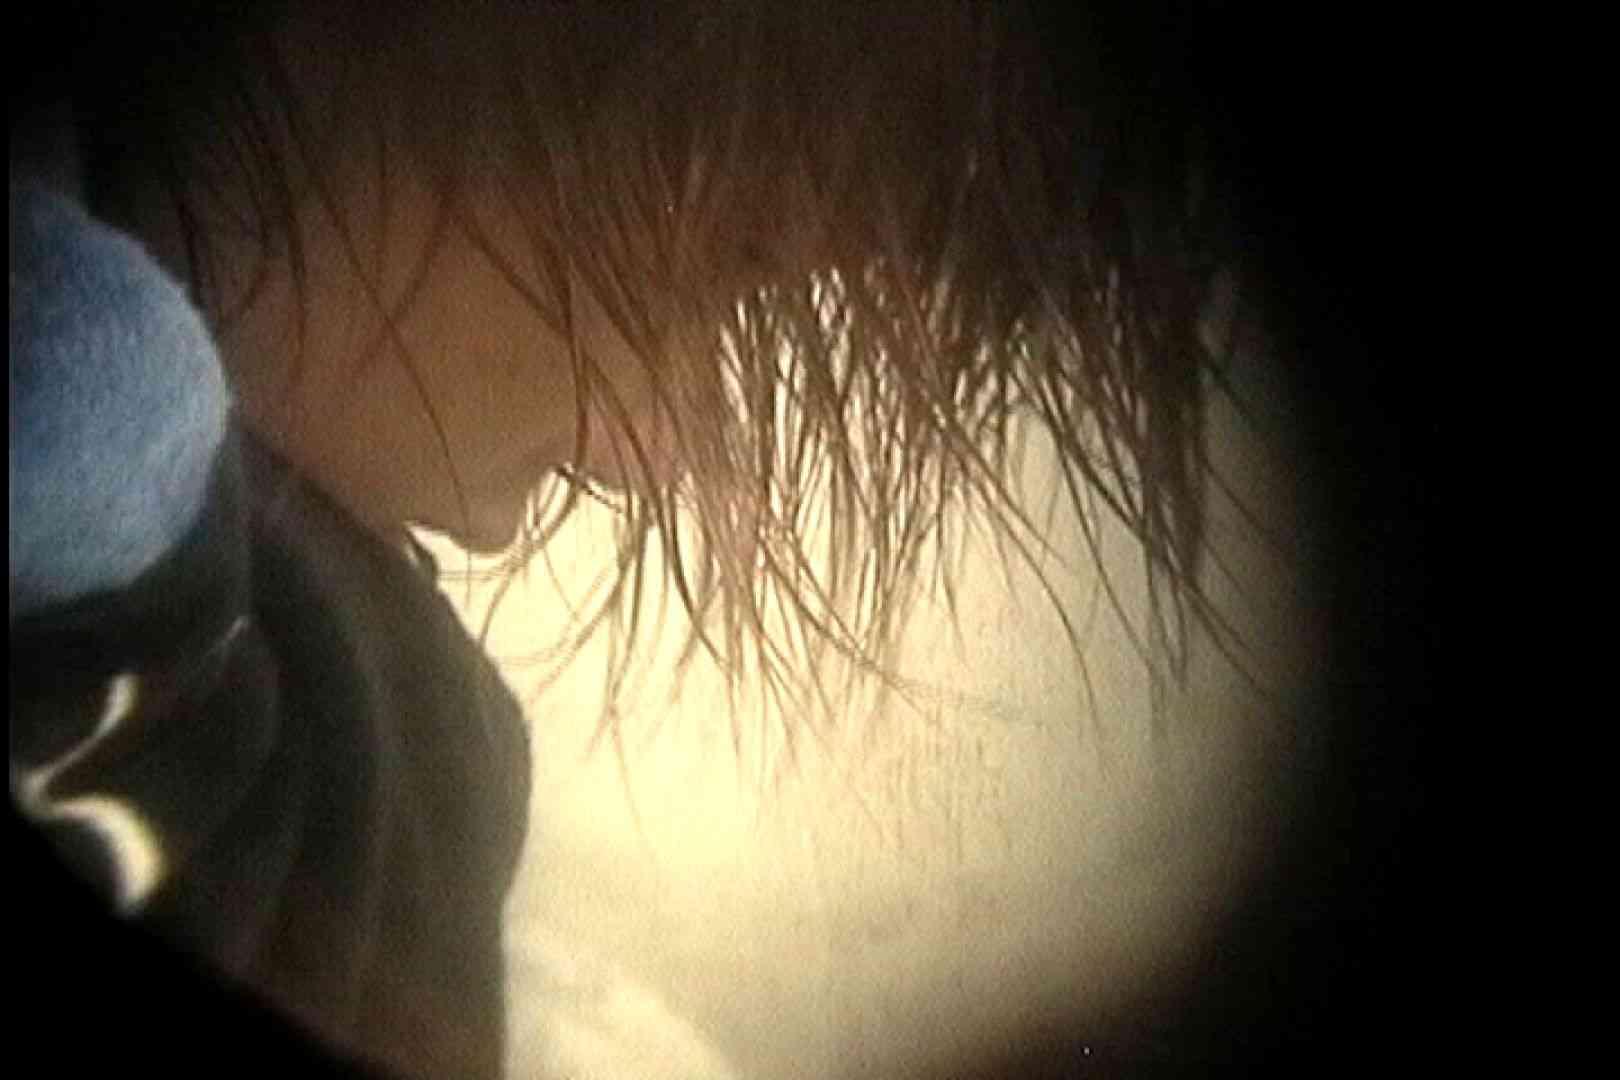 No.88 張りのある見事な巨乳のゆれ具合を堪能 巨乳 セックス無修正動画無料 68画像 12